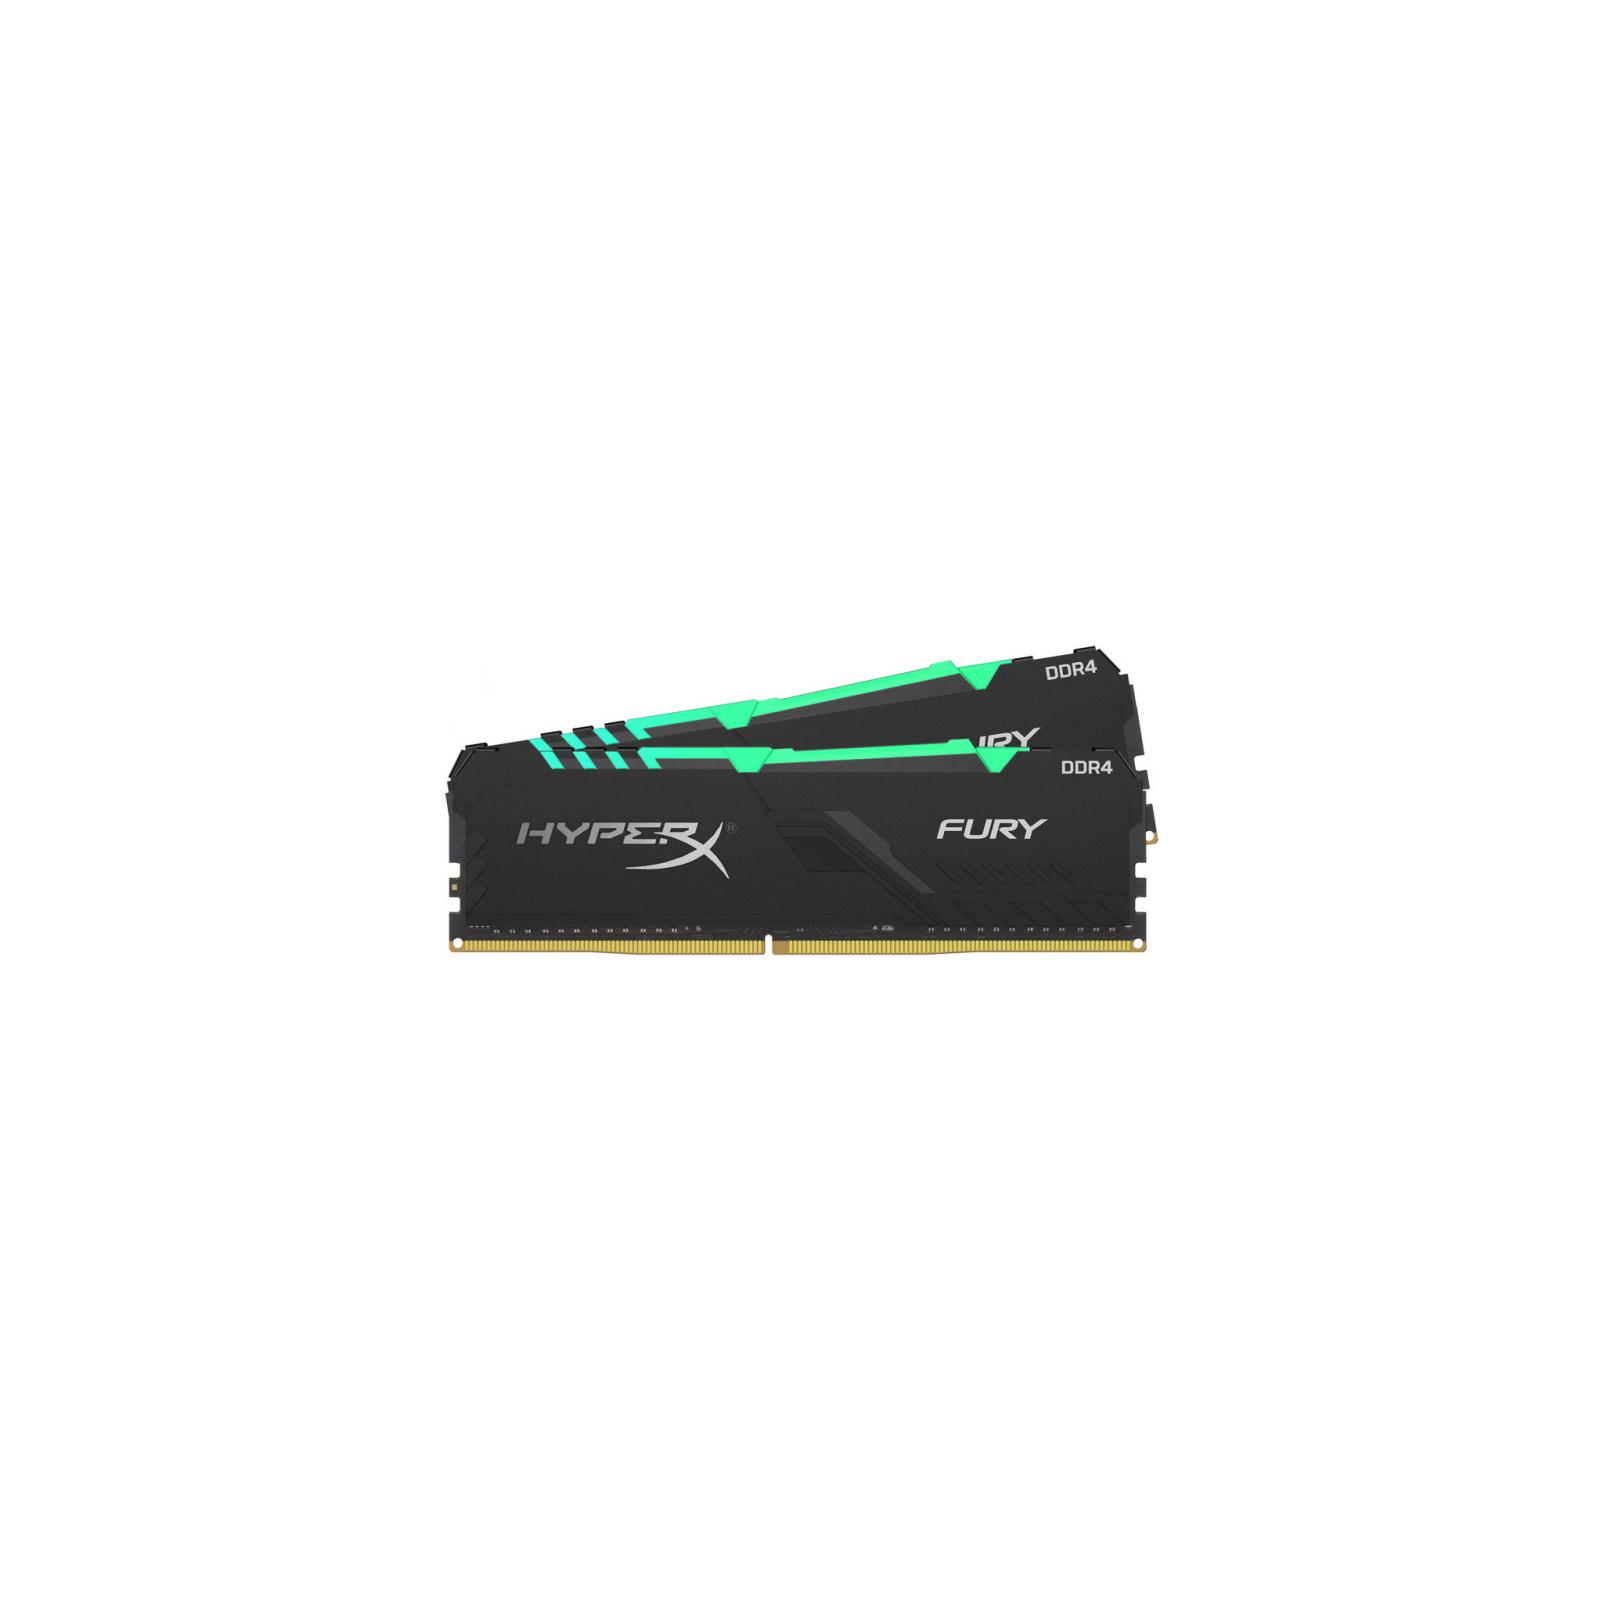 Модуль памяти для компьютера DDR4 16GB (2x8GB) 2666 MHz HyperX Fury Black RGB Kingston (HX426C16FB3AK2/16) изображение 2